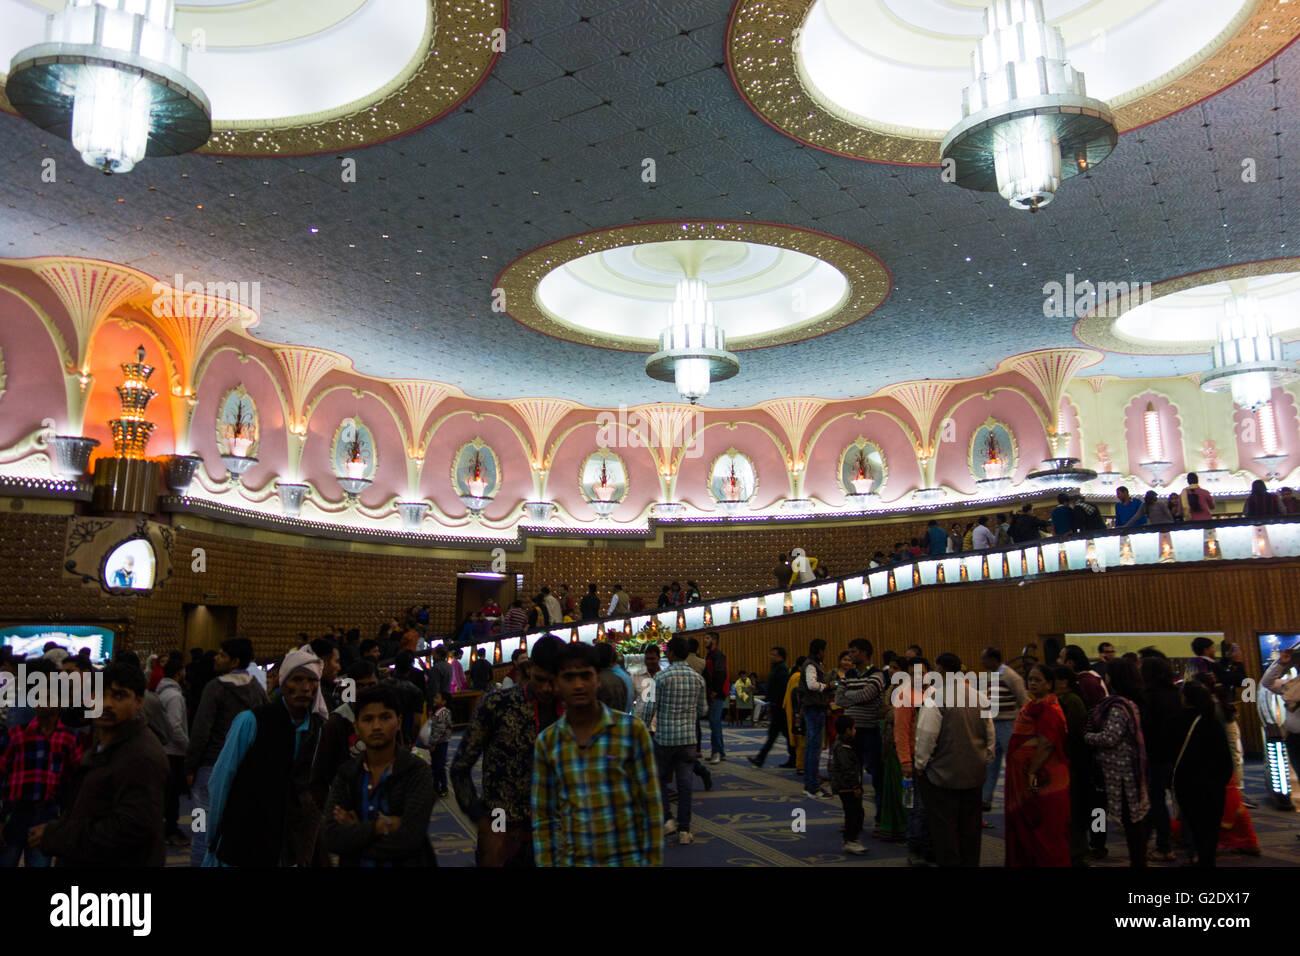 The Raj Mandir cinema lobby in Jaipur, India - Stock Image